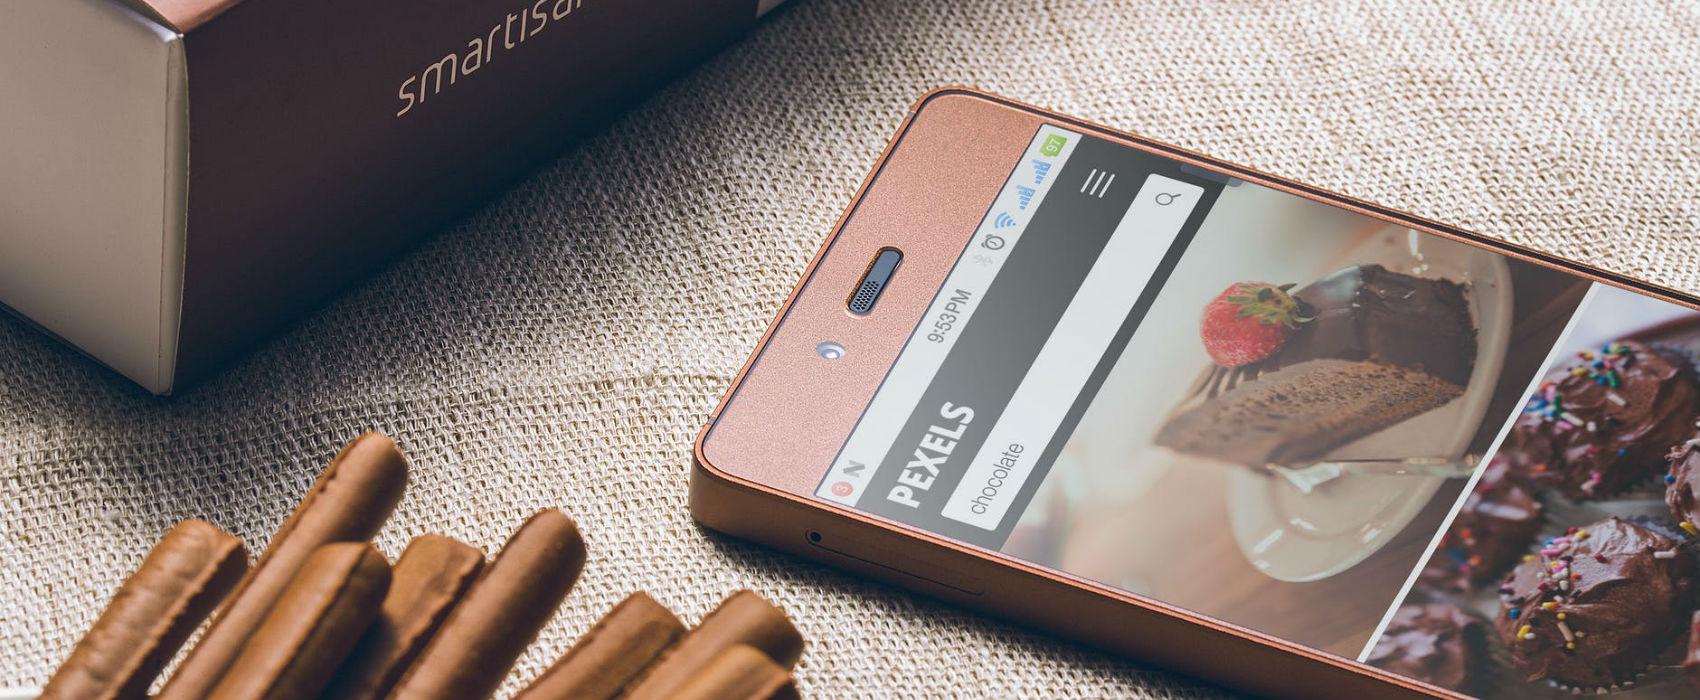 mobile web on smartphone